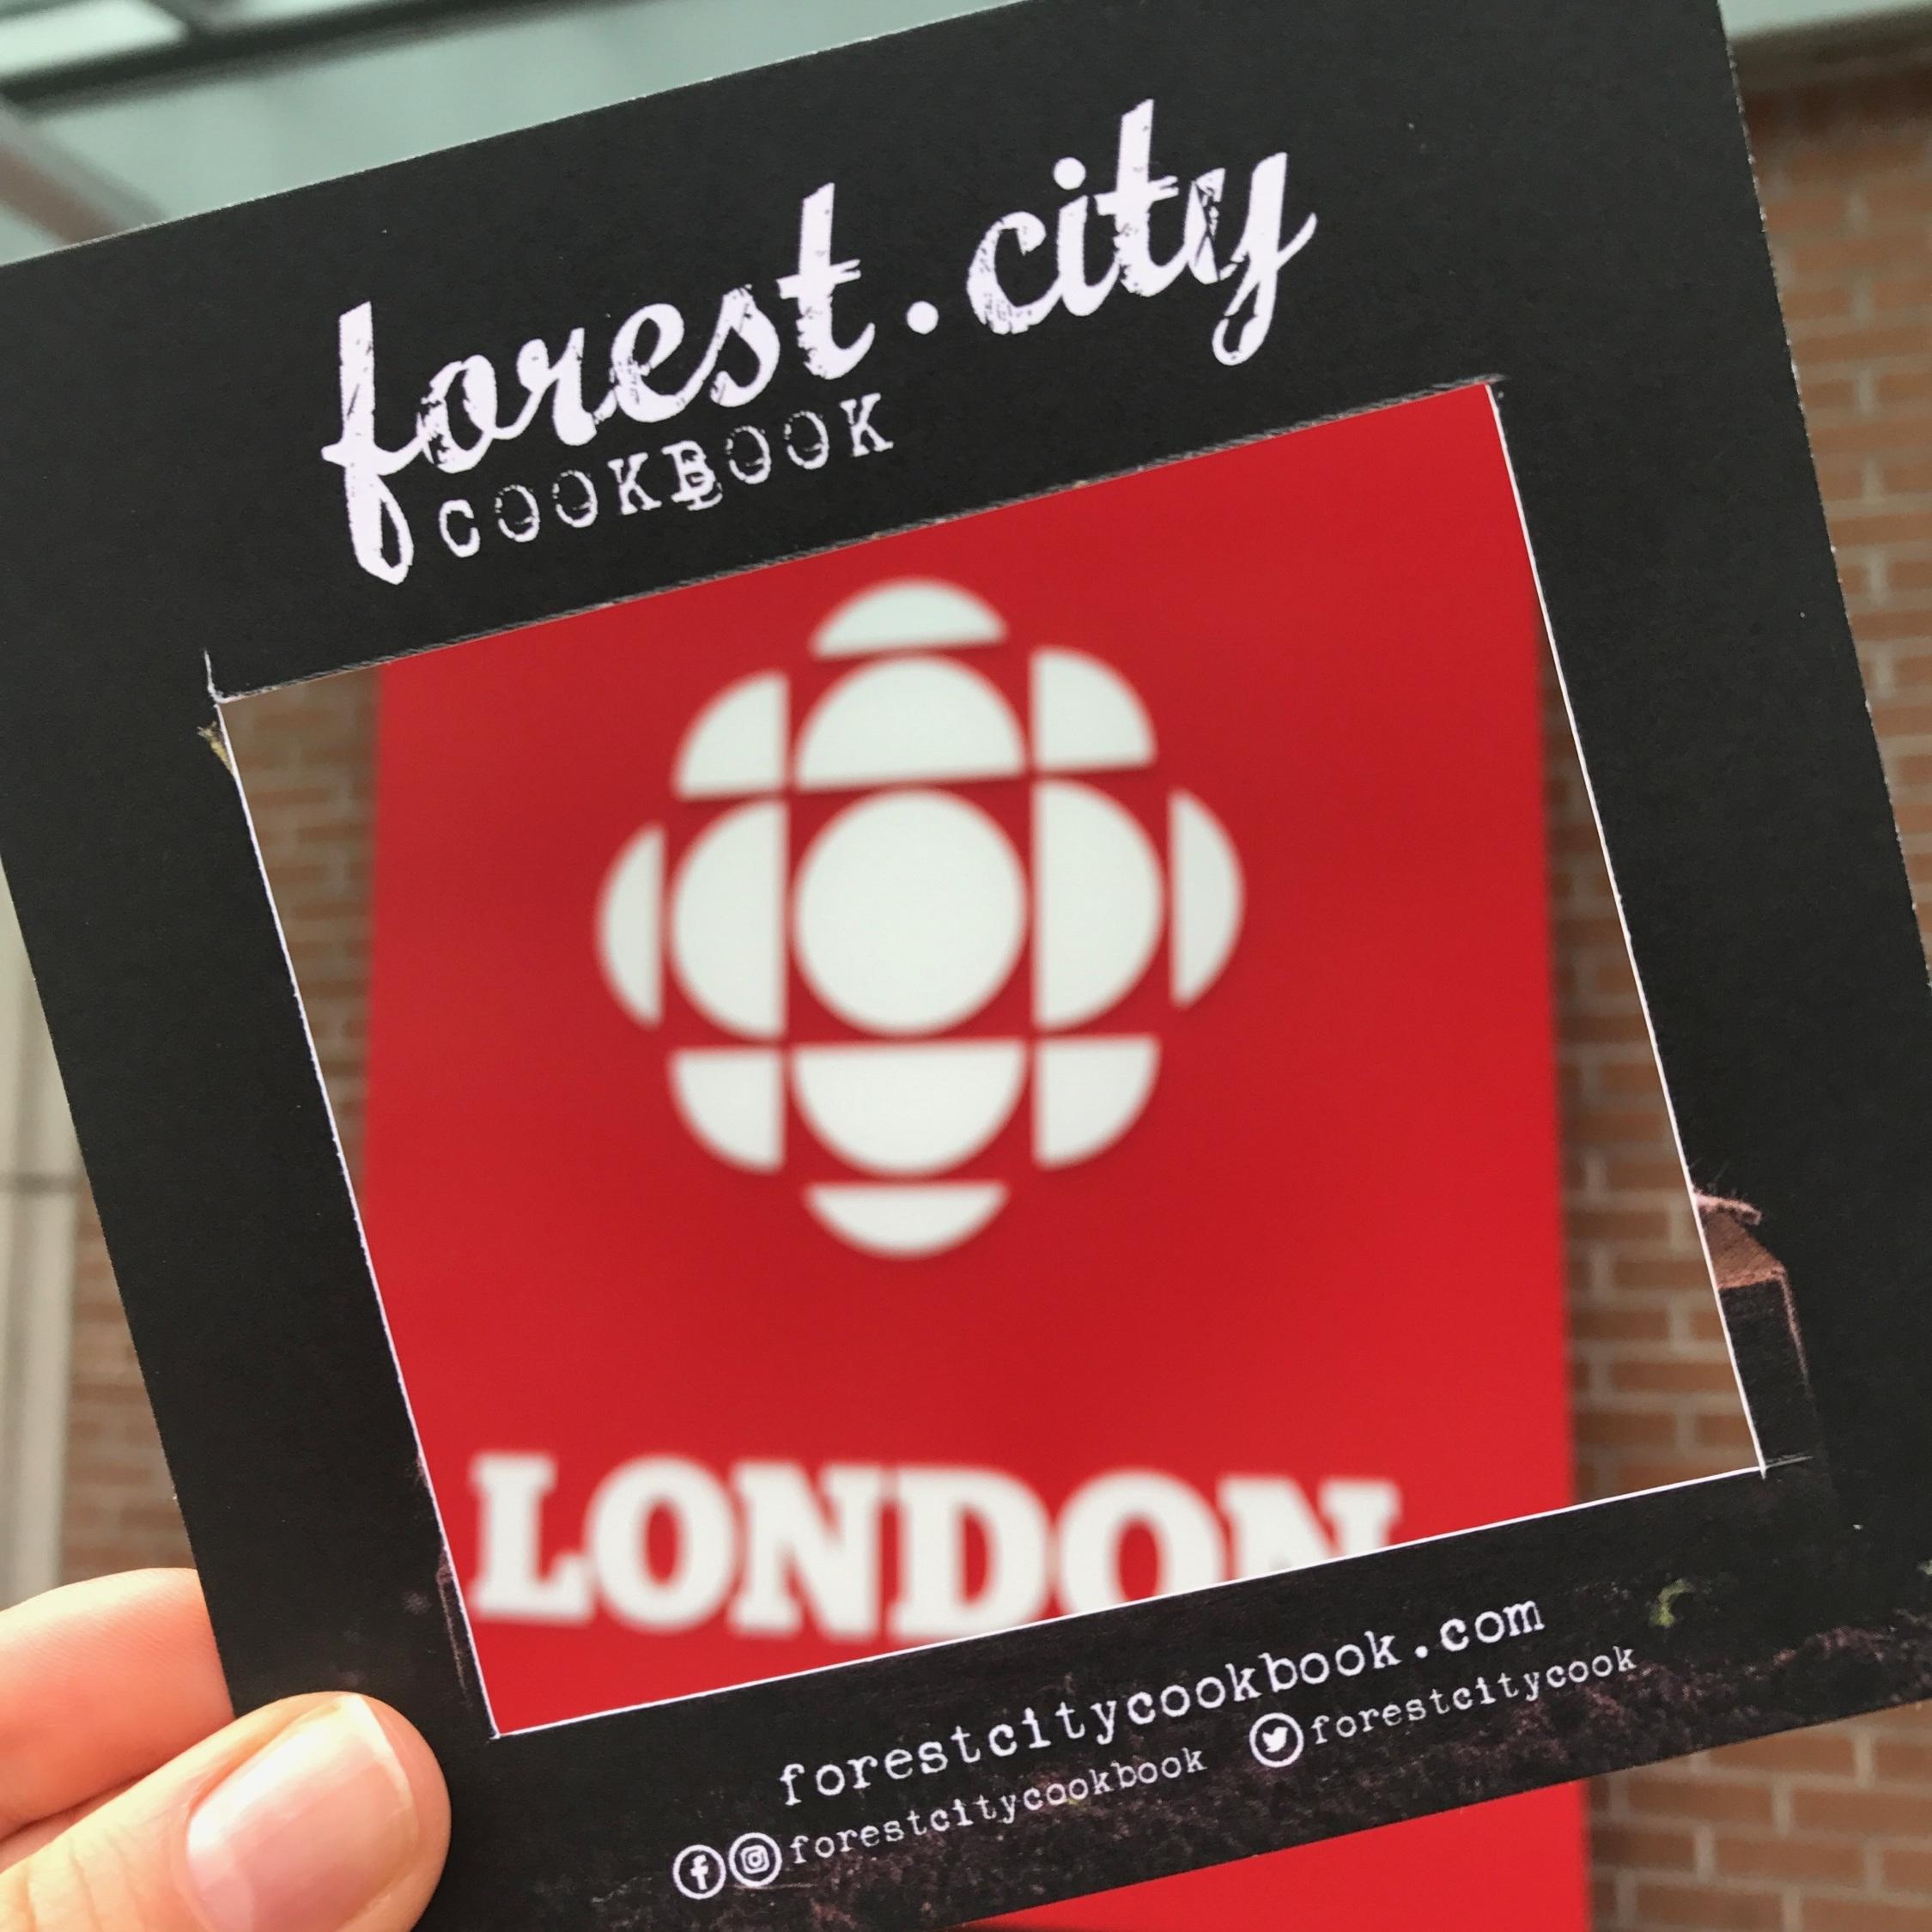 ForestCity Cookbok - CBC News